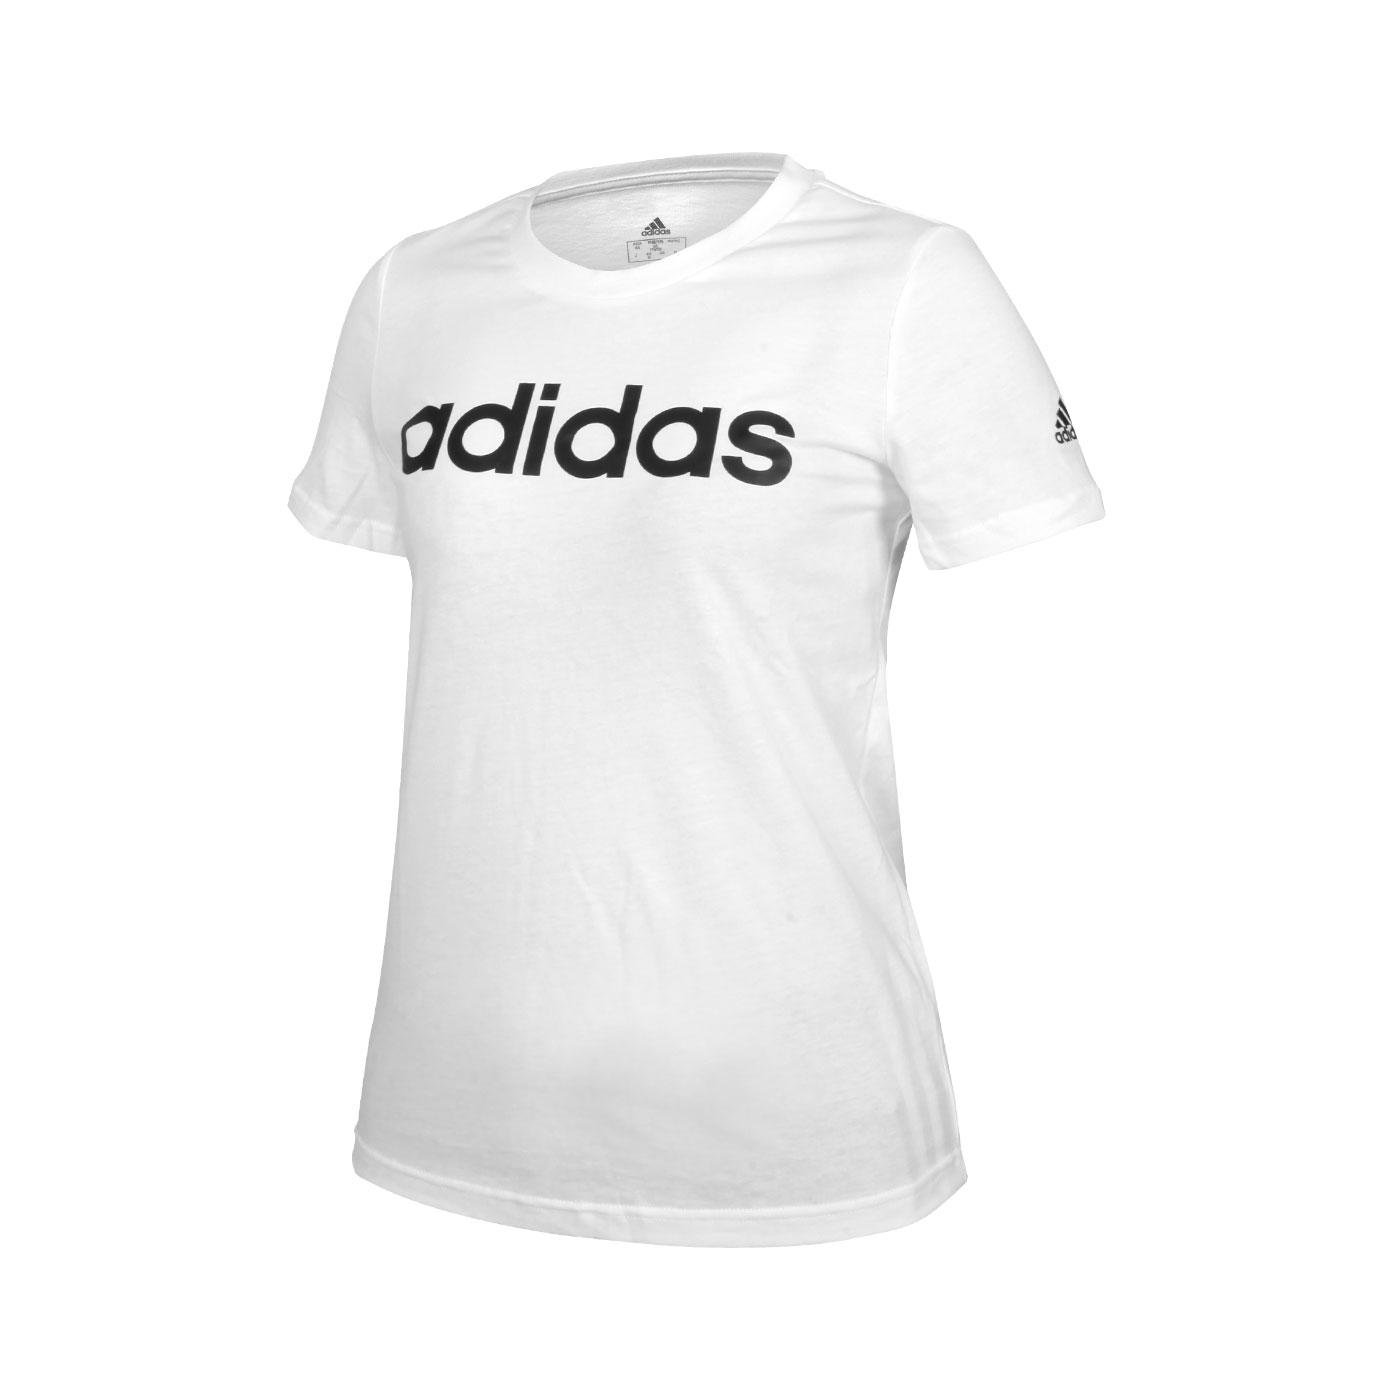 ADIDAS 女款短袖T恤 GL0768